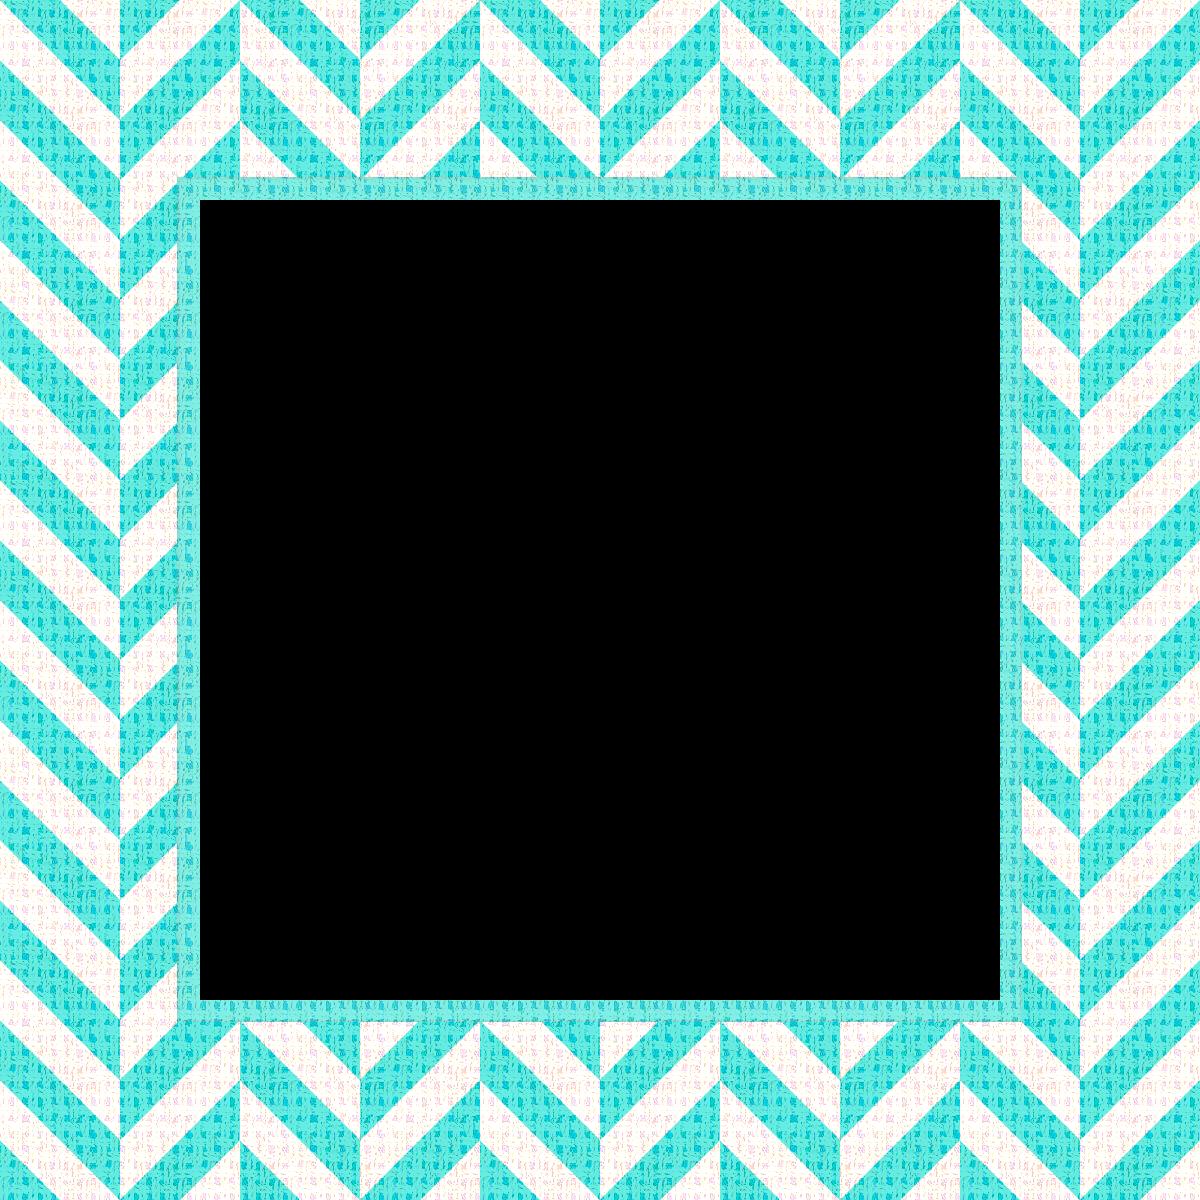 Teal blue chevron border clipart vector library stock Free Chevron Frame Cliparts, Download Free Clip Art, Free Clip Art ... vector library stock